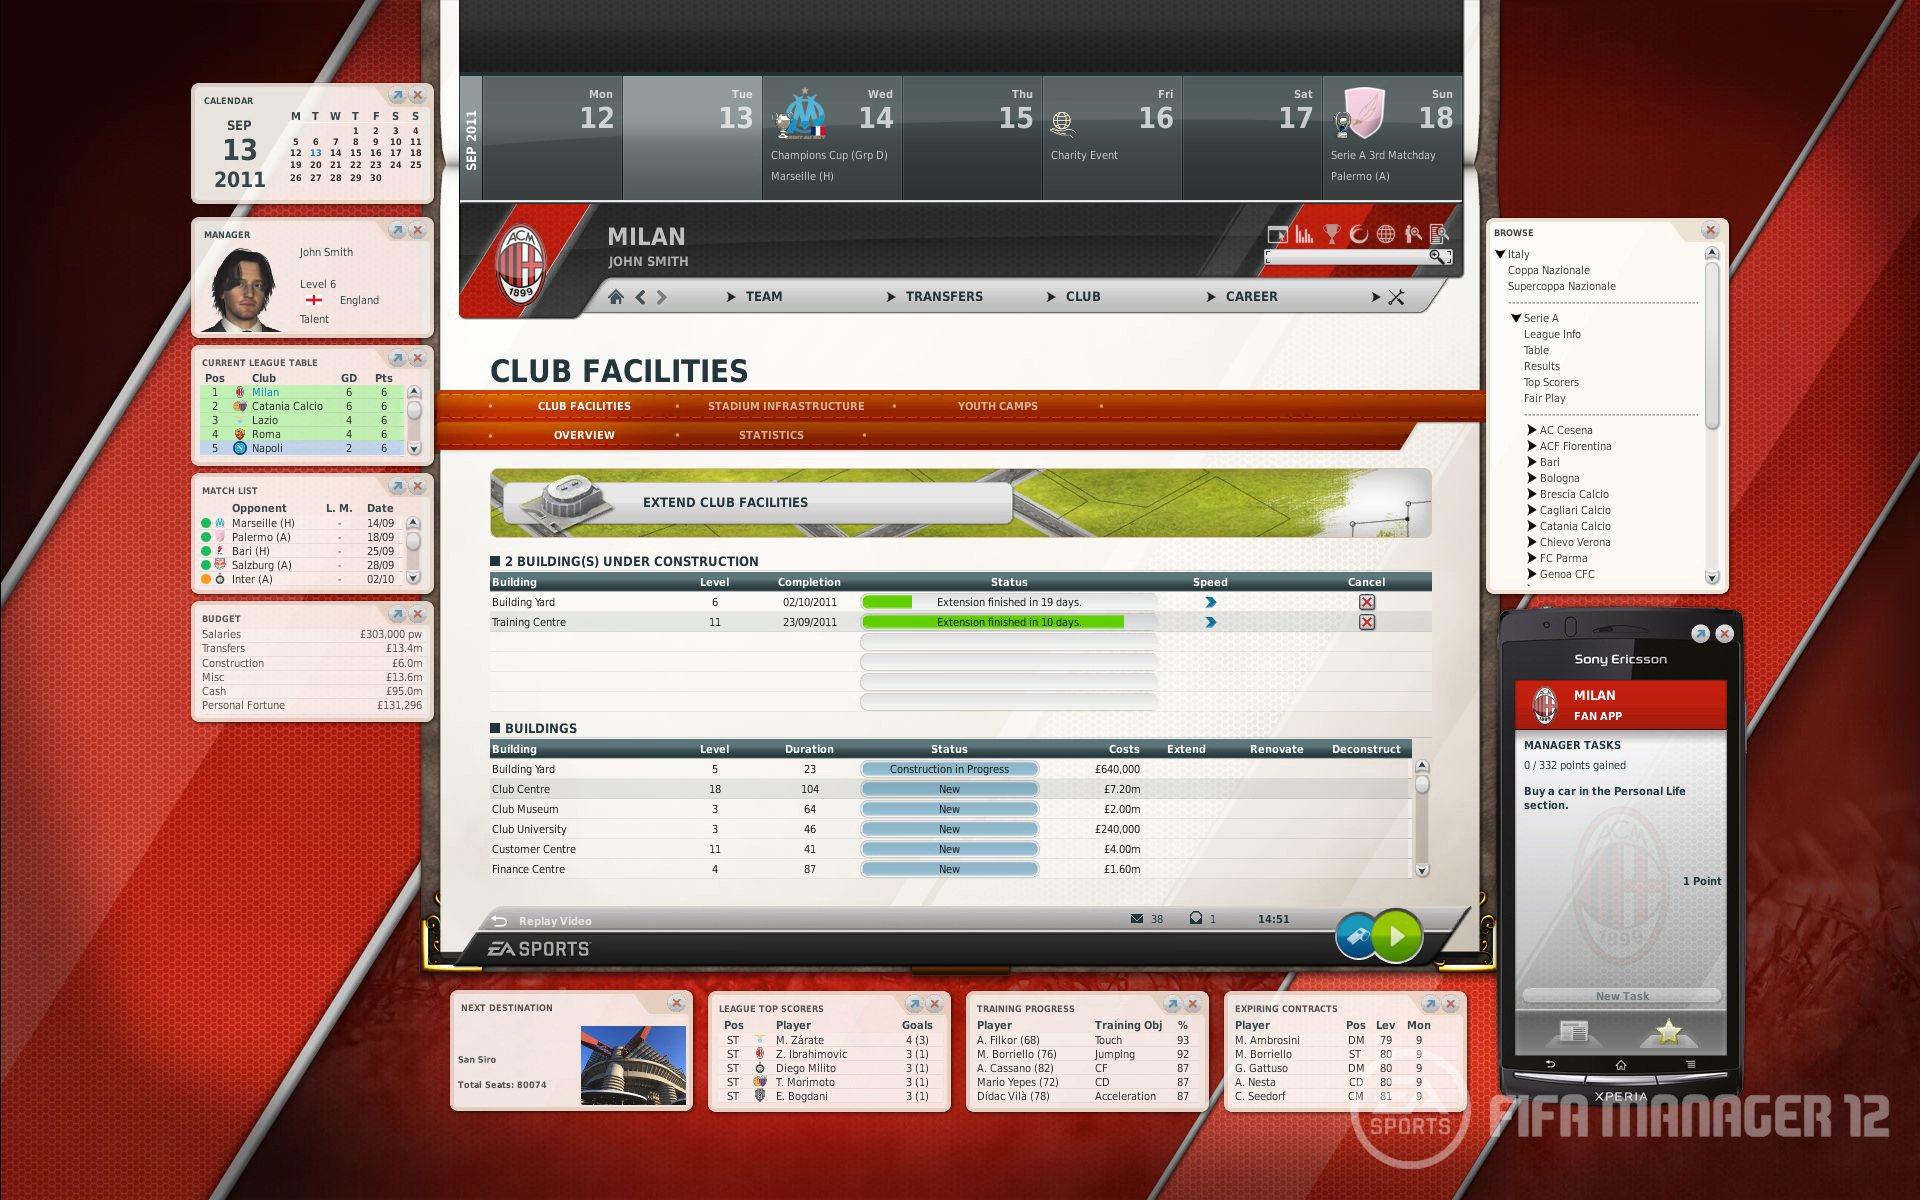 FIFA Manager 12 - Prime immagini